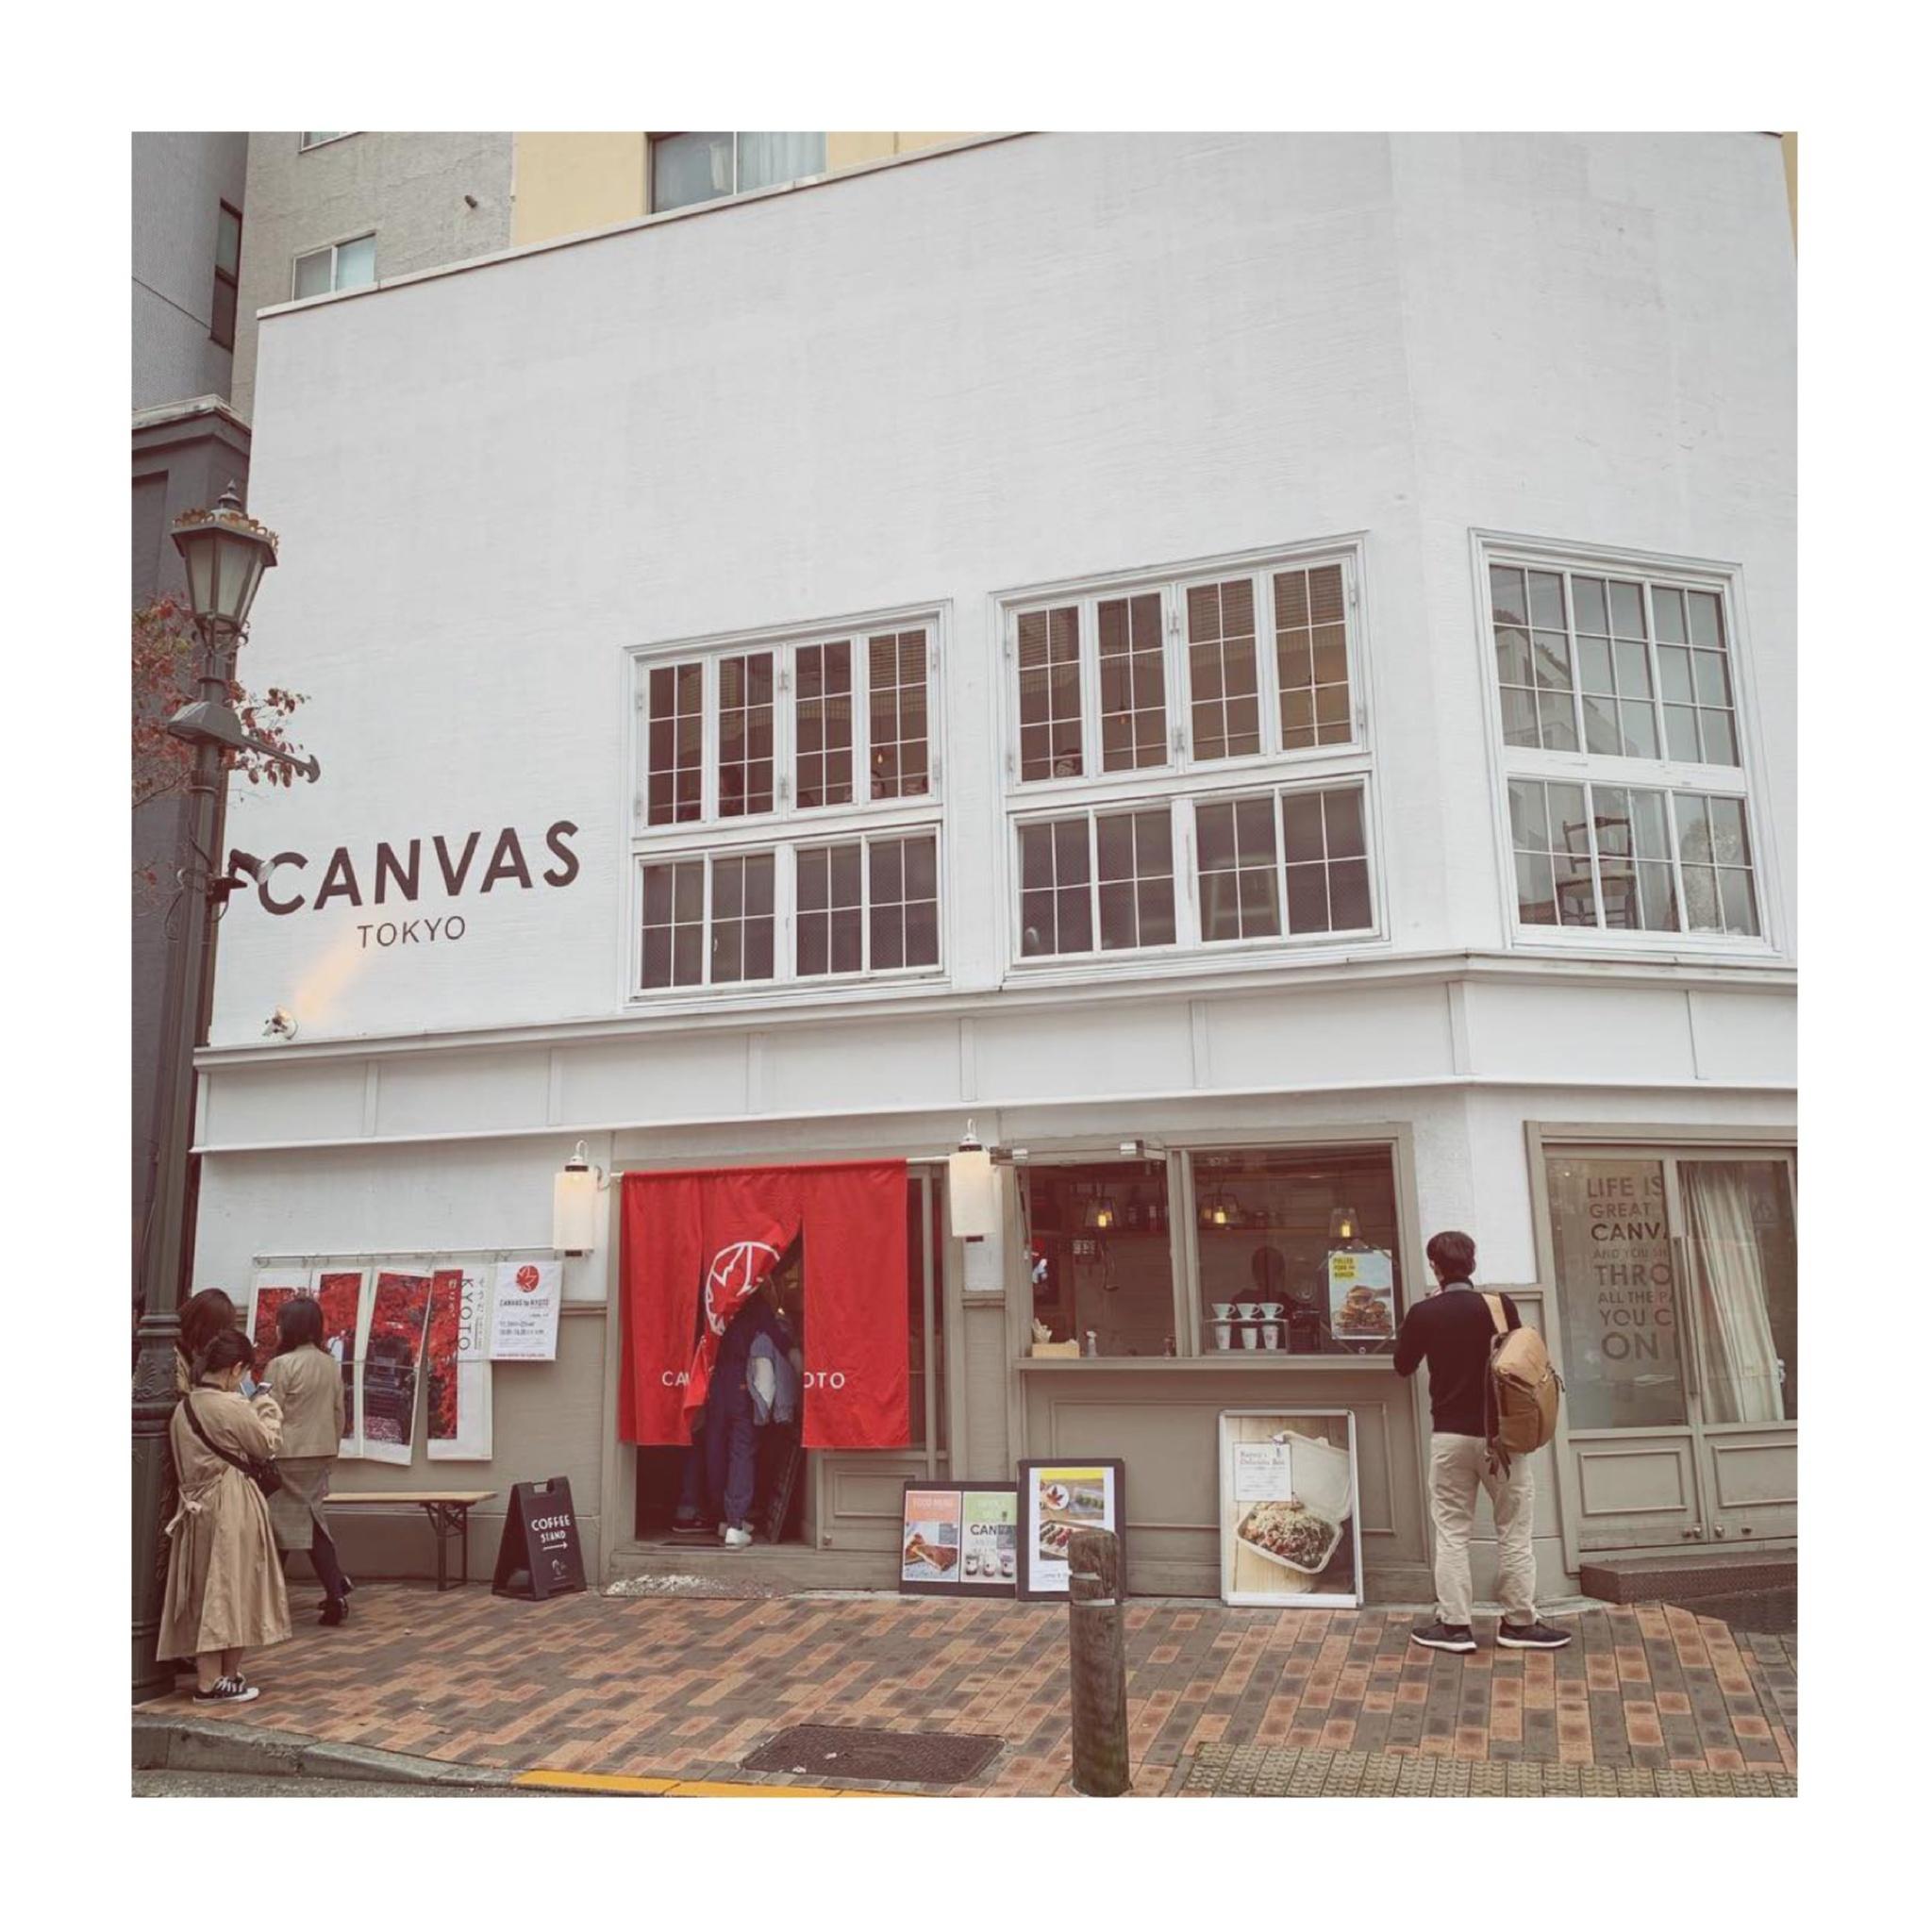 #19【#cafestagram】❤️:《東京•広尾》〜11/25まで期間限定!大人気カフェ『CANVAS TOKYO』で飲める紅葉のカラーラテをチェック☻_1